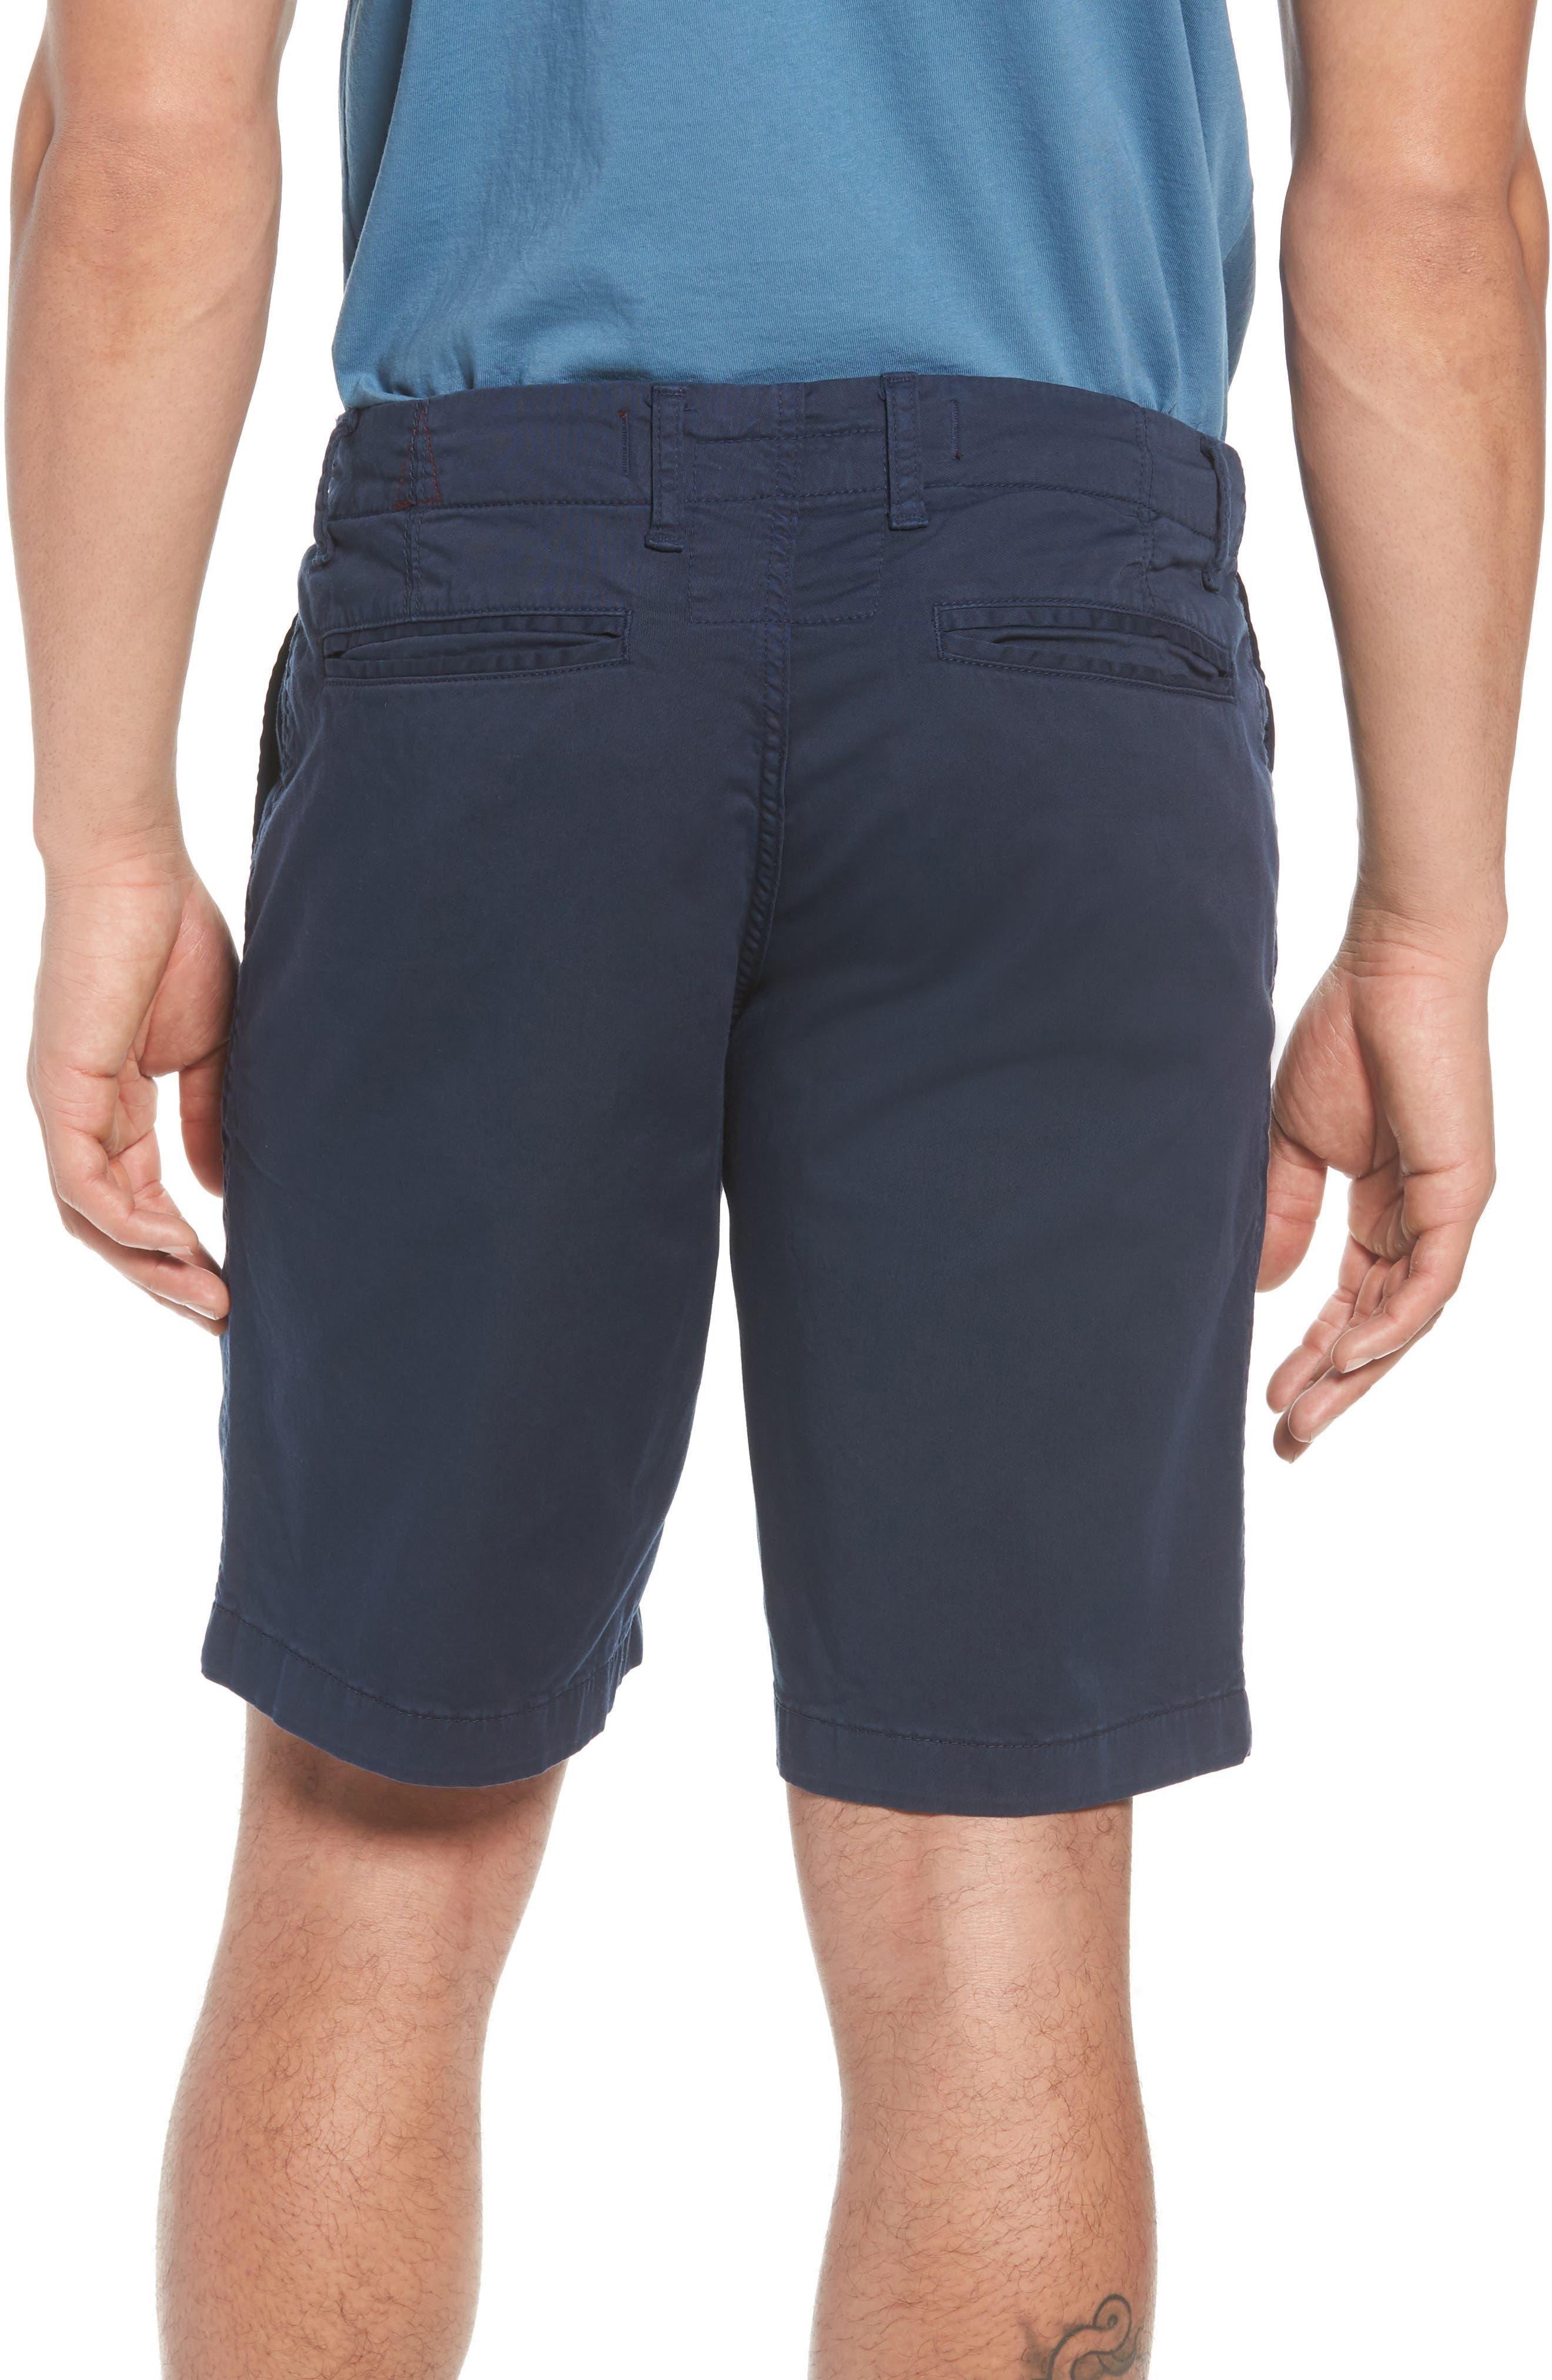 St. Barts Twill Shorts,                             Alternate thumbnail 21, color,